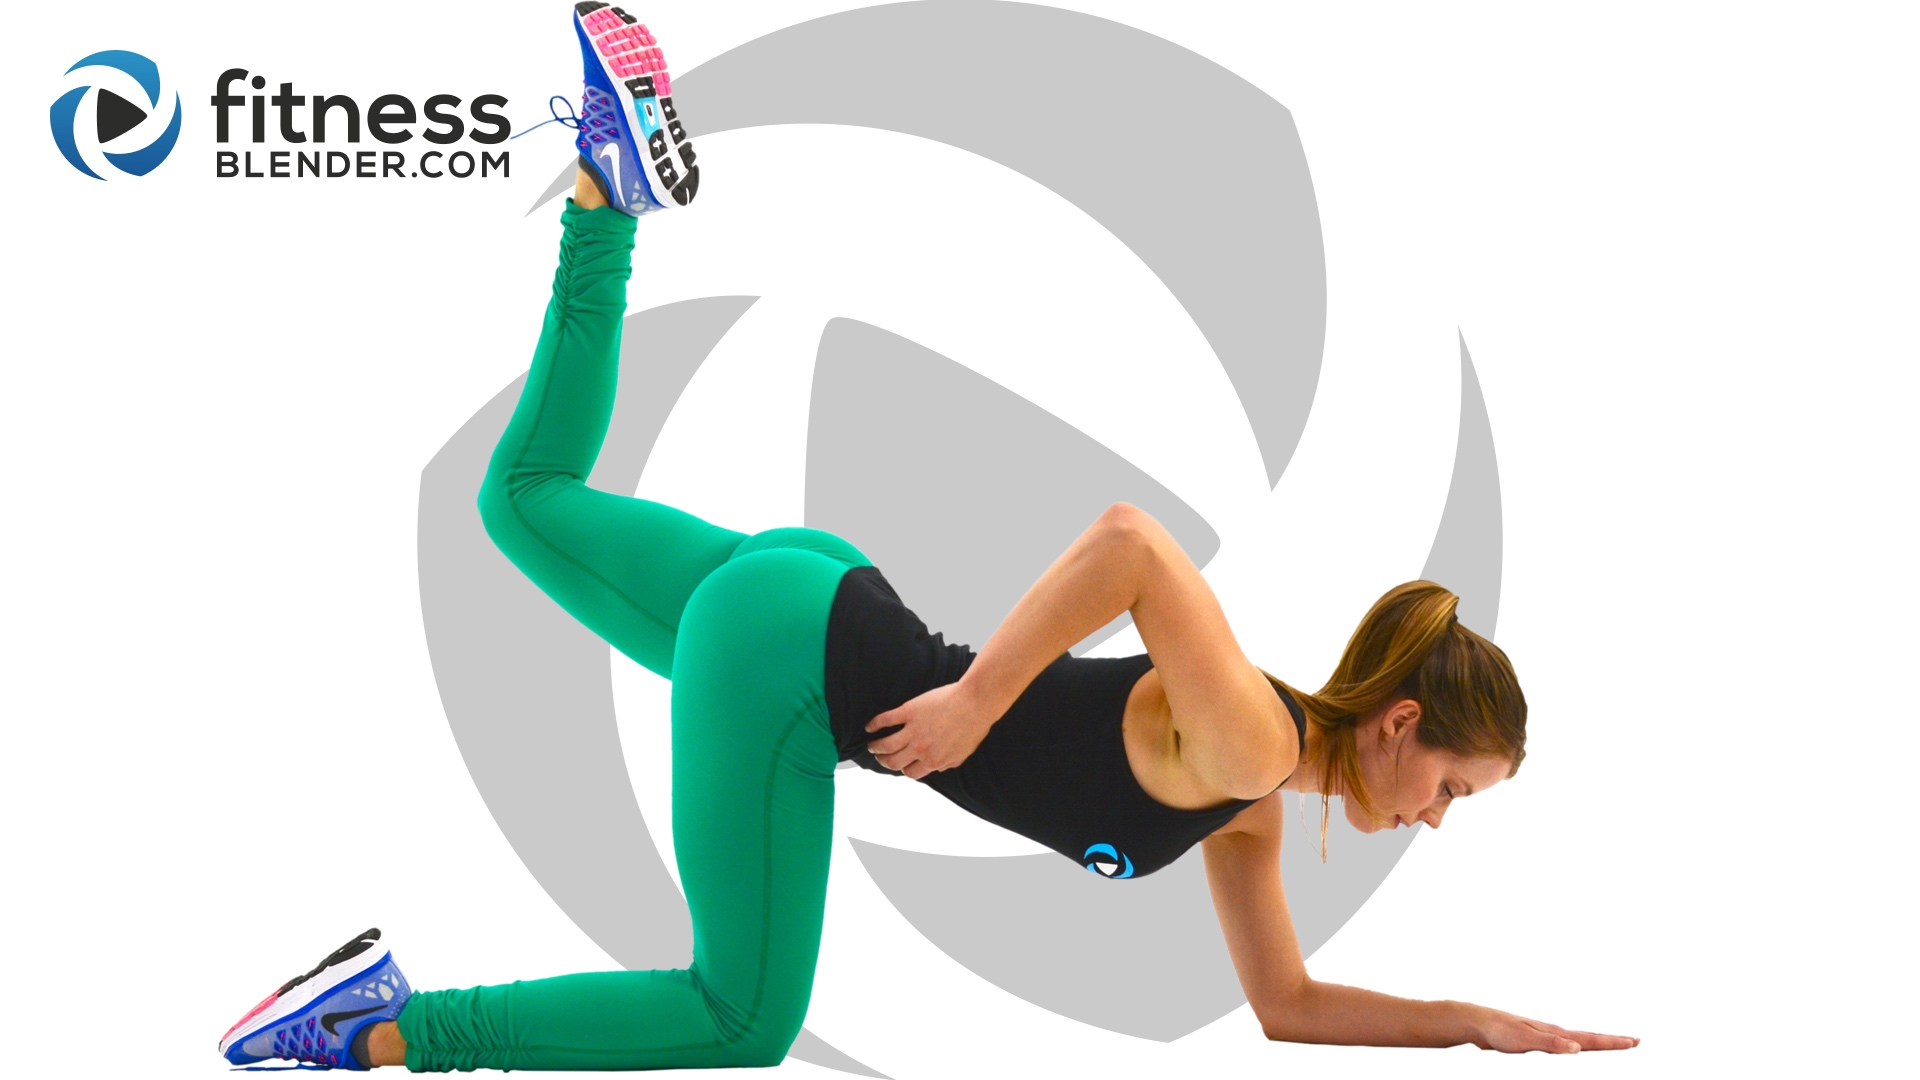 Fitness Blender Arms